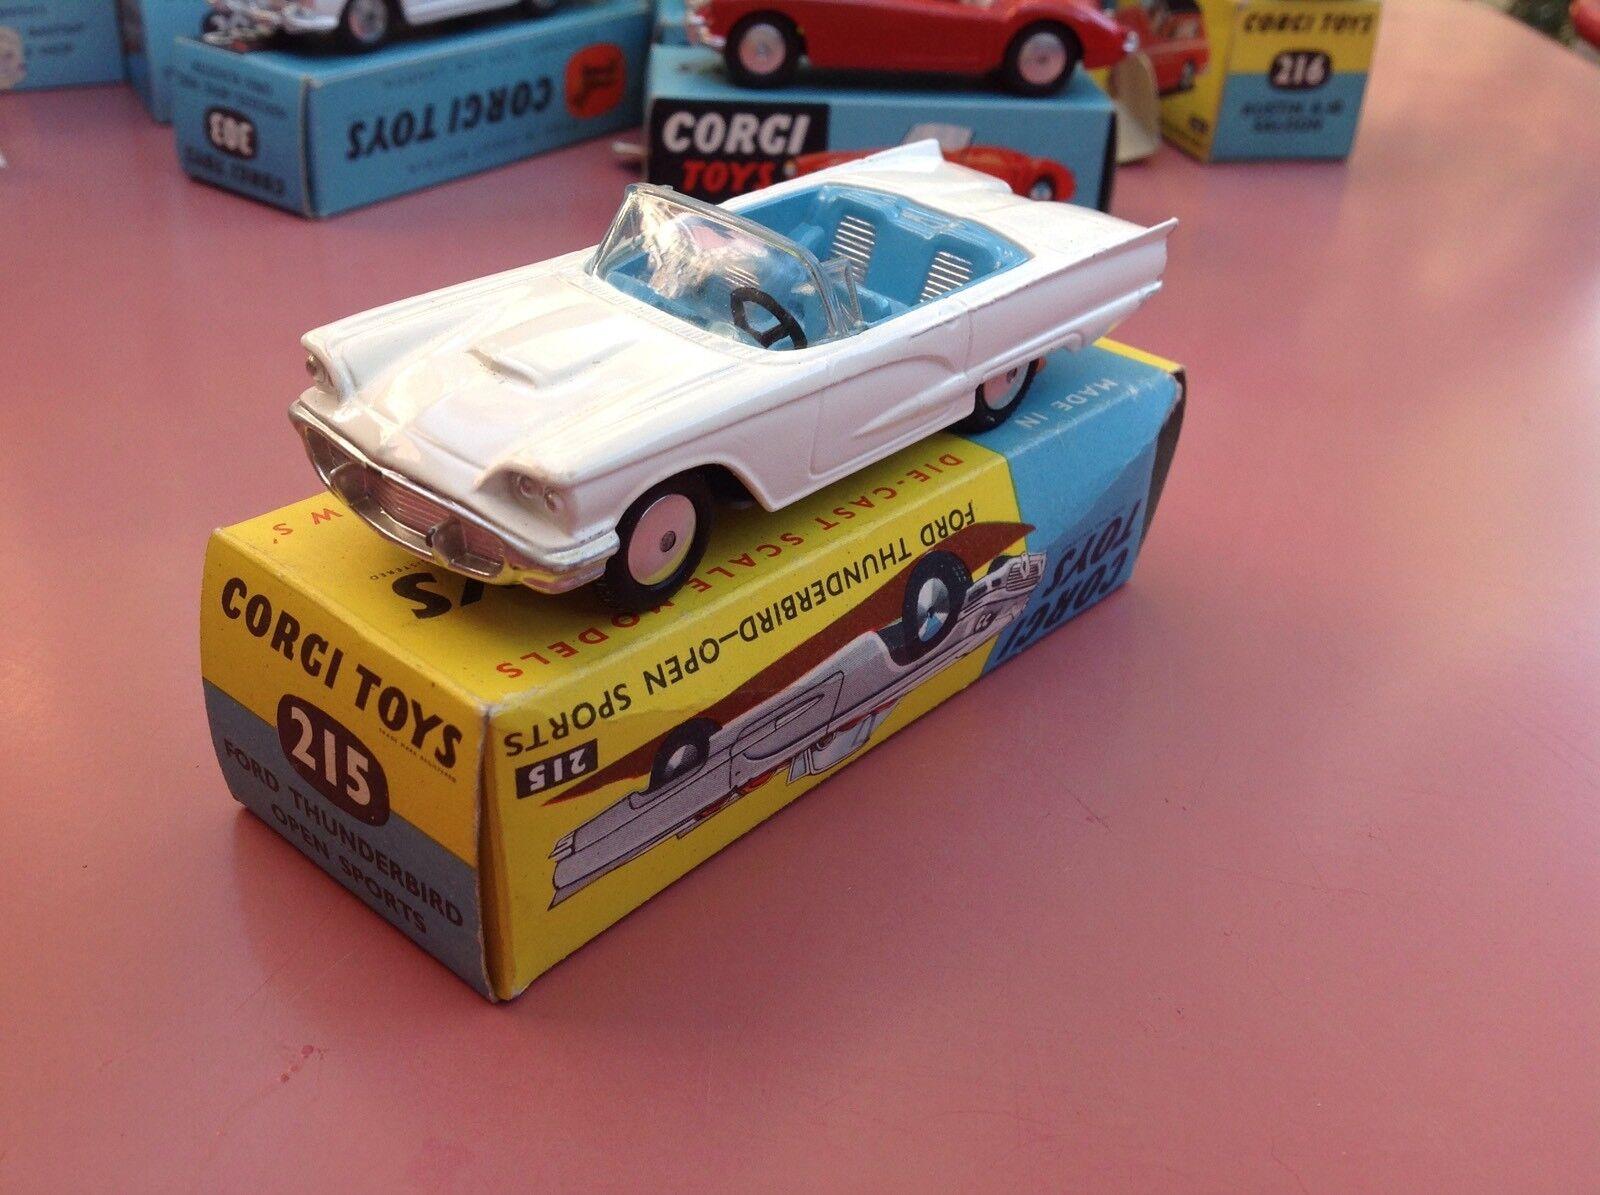 Corgi Toys REF 215 Ford thunderbird   near Mint in original box